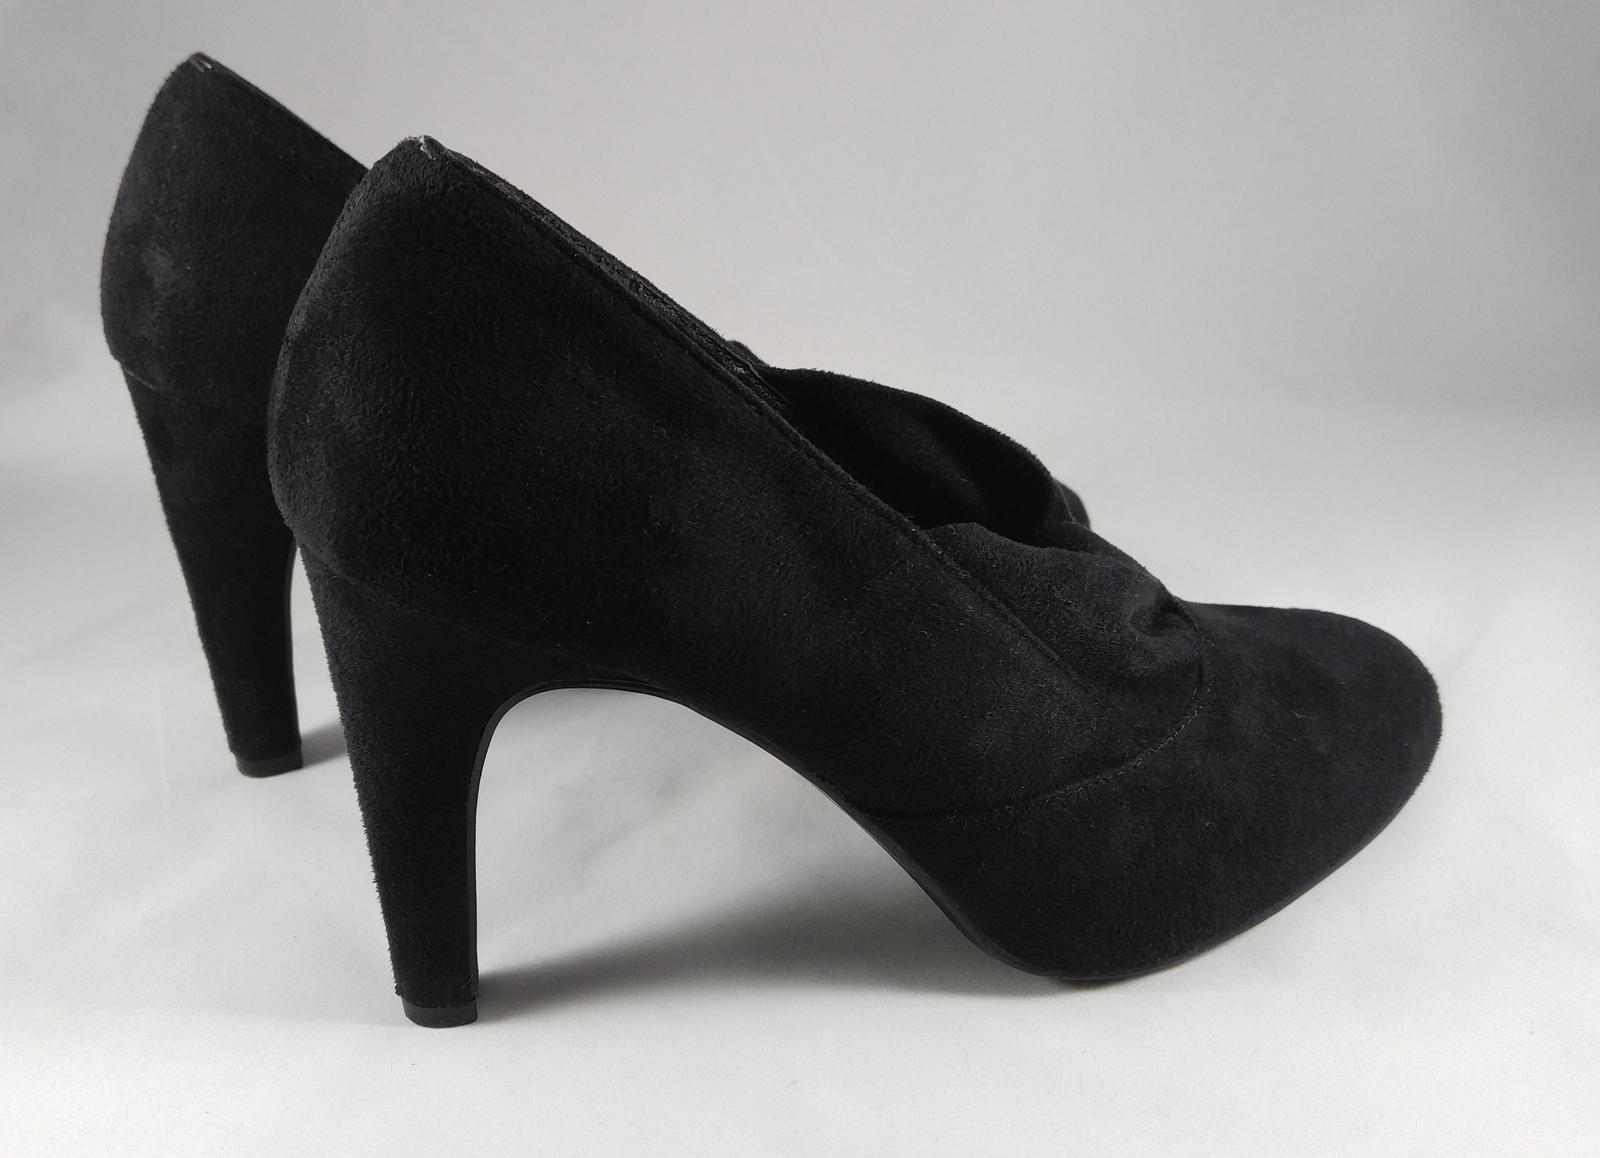 Ann Marino 1930s Style Classic Pumps Heels Shoes Black Vegan Suede